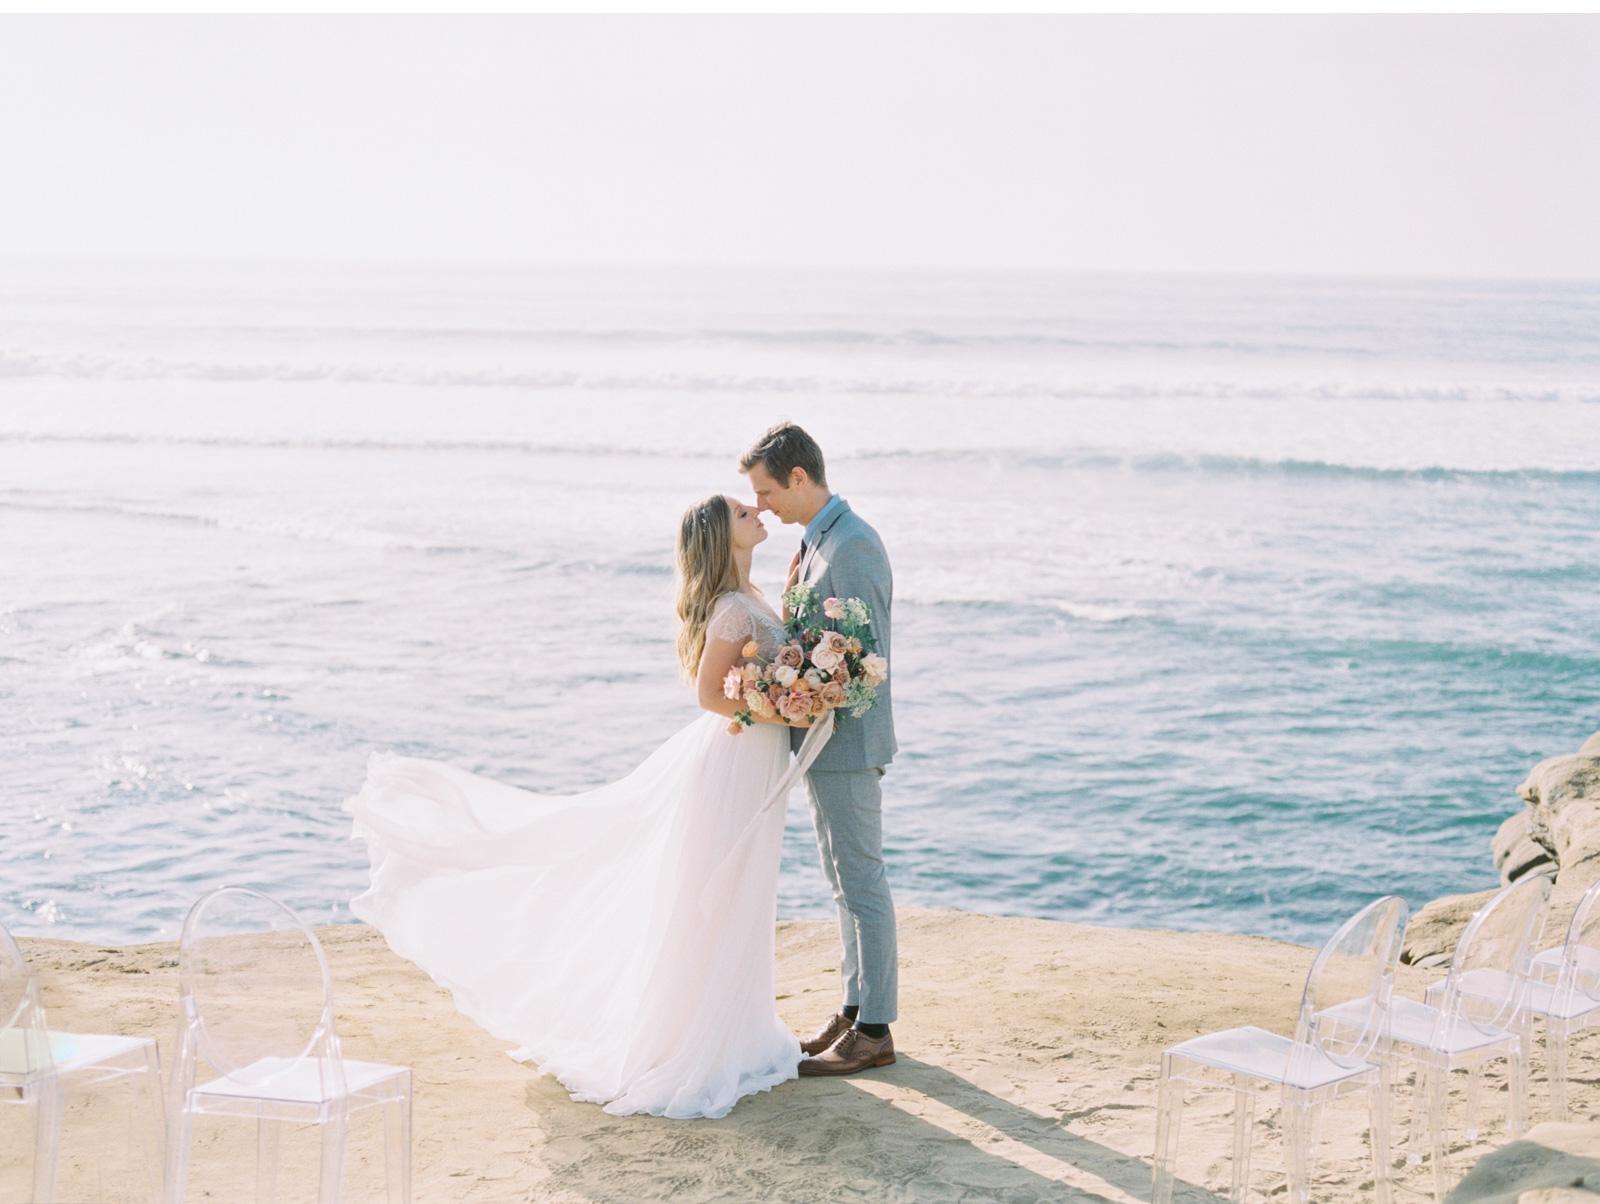 Style-Me-Pretty-California-Beach-Wedding-Natalie-Schutt-Photography_07.jpg